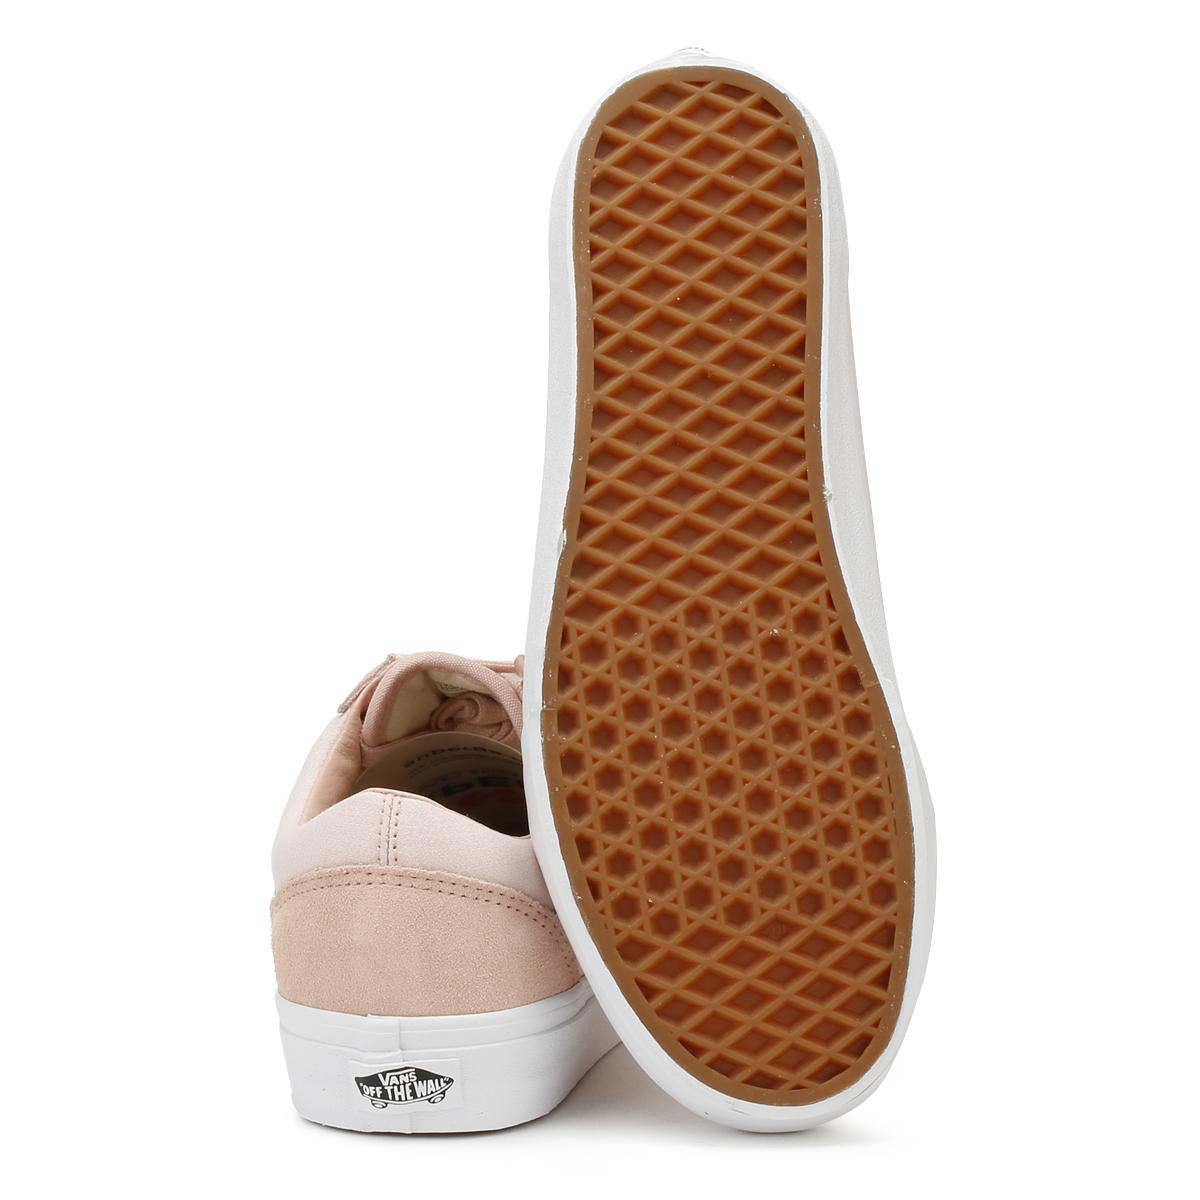 Vans True Unisex Sand & True Vans White Suiting Old Skool Lace Up Casual Shoes e3212c